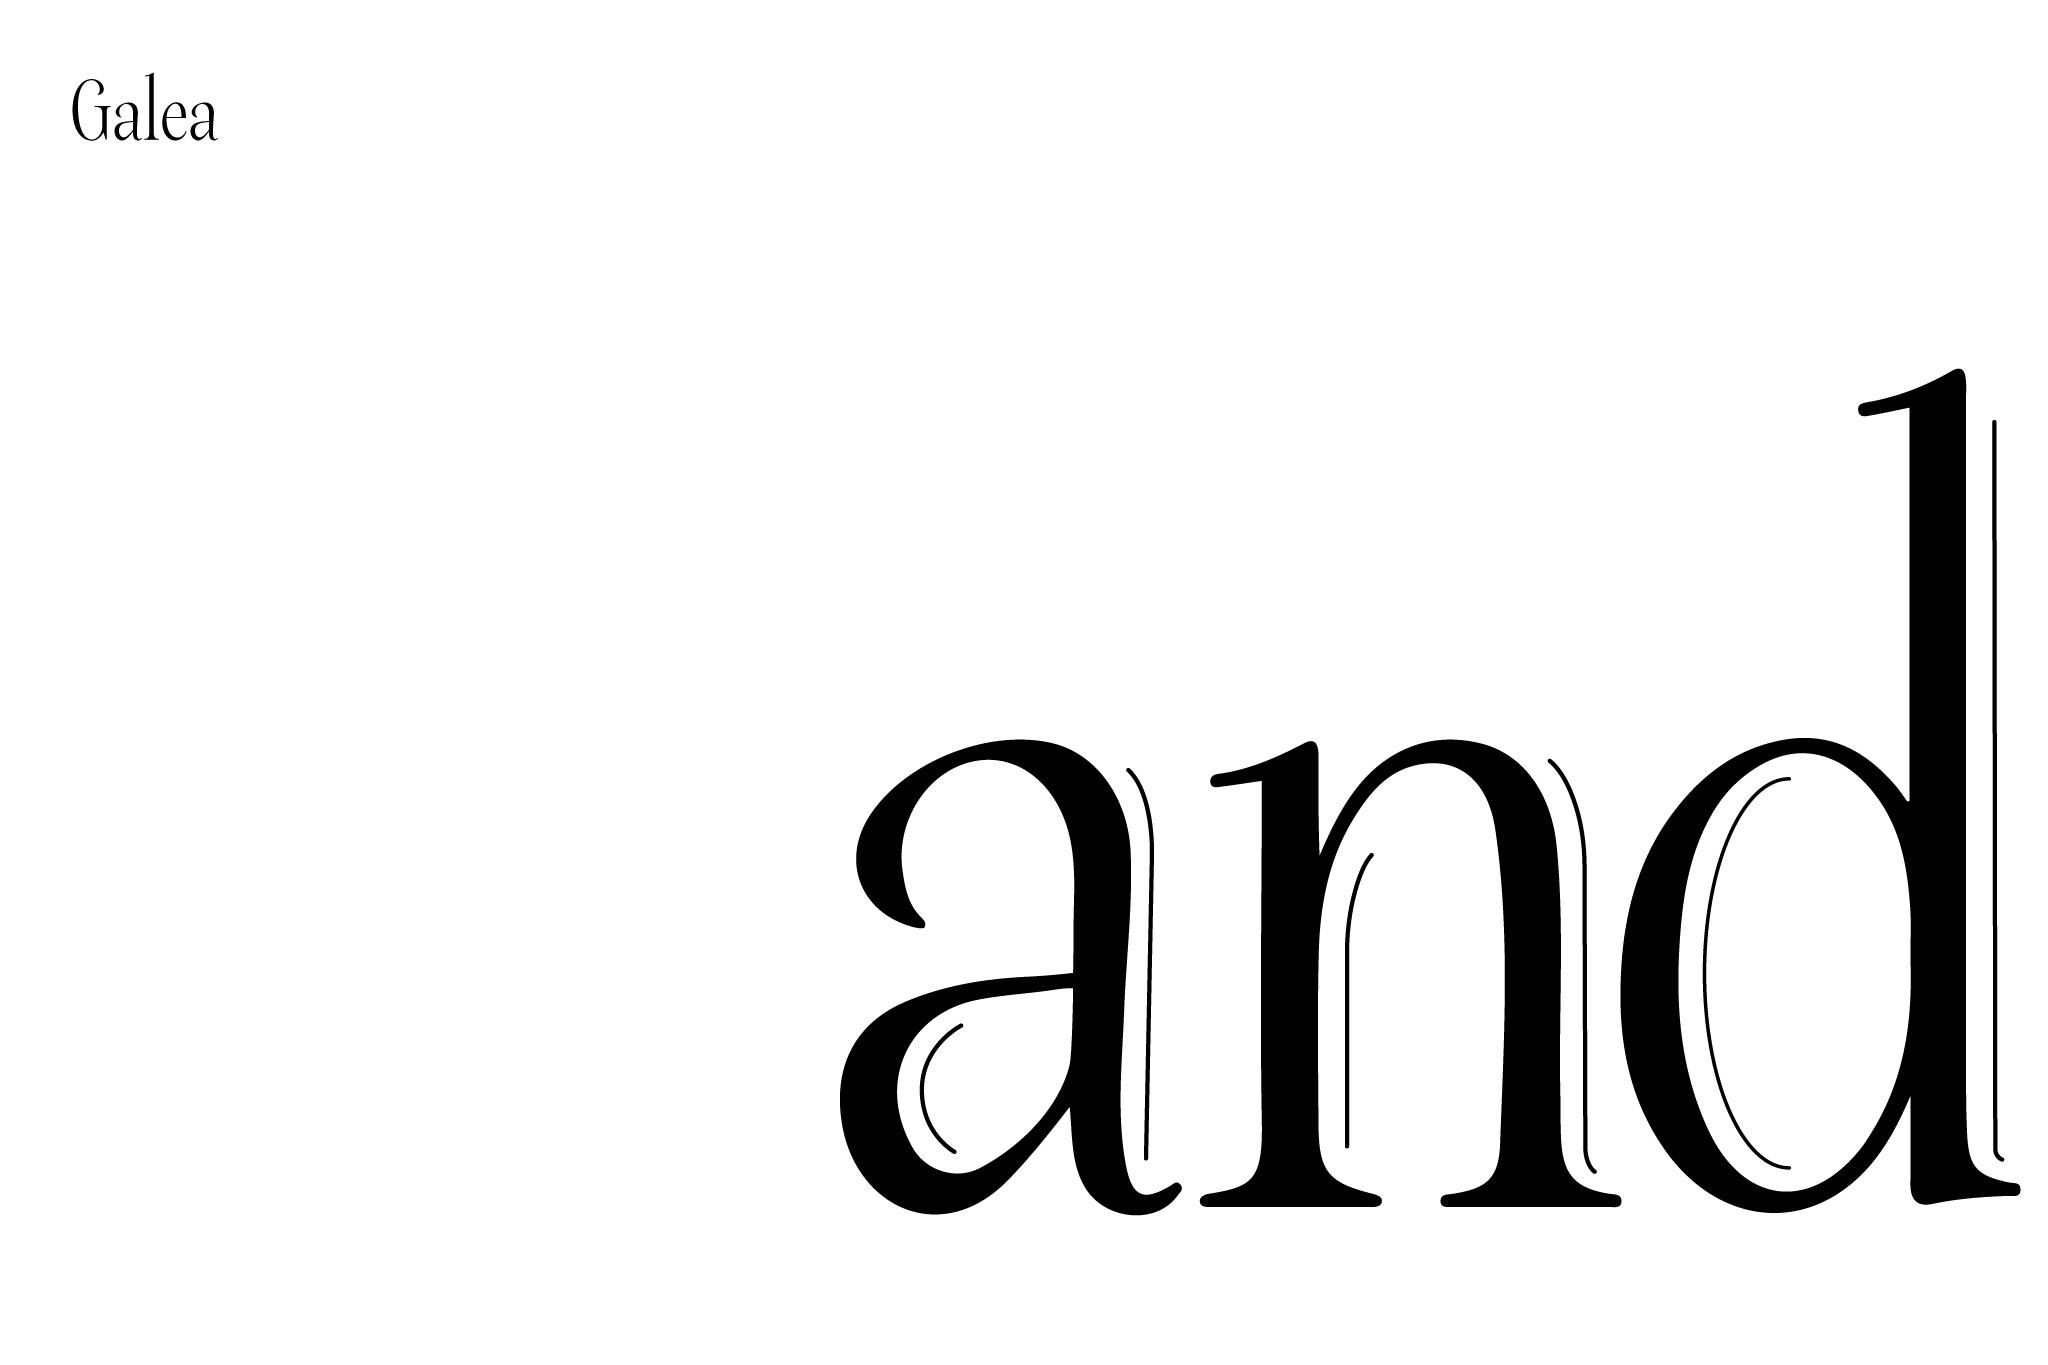 andinc_type_galea©arbol